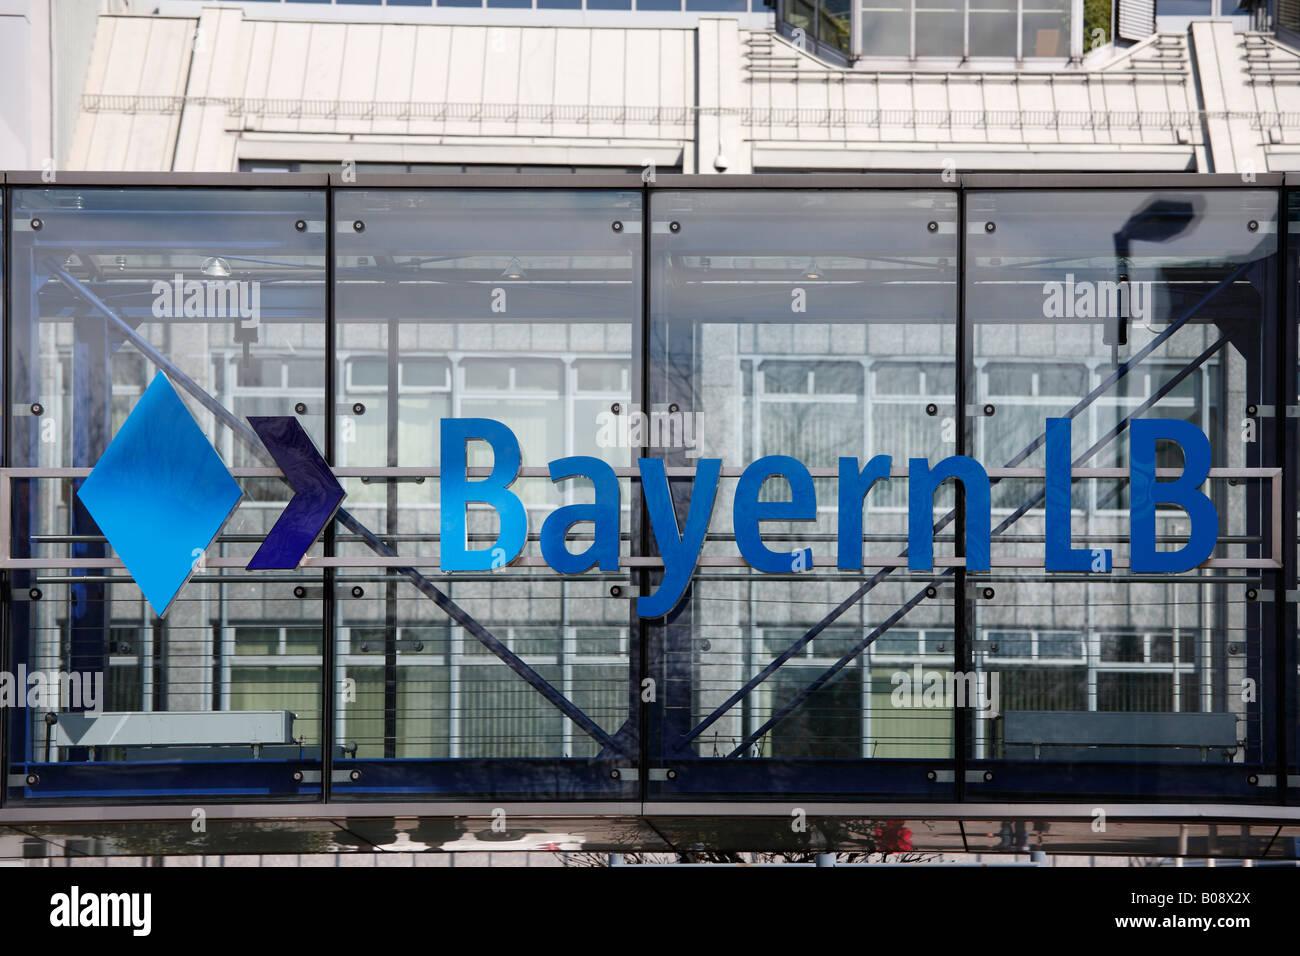 Sign for Bayern LB, Bayerische Landesbank (Bavarian State Bank), Munich, Bavaria, Germany - Stock Image